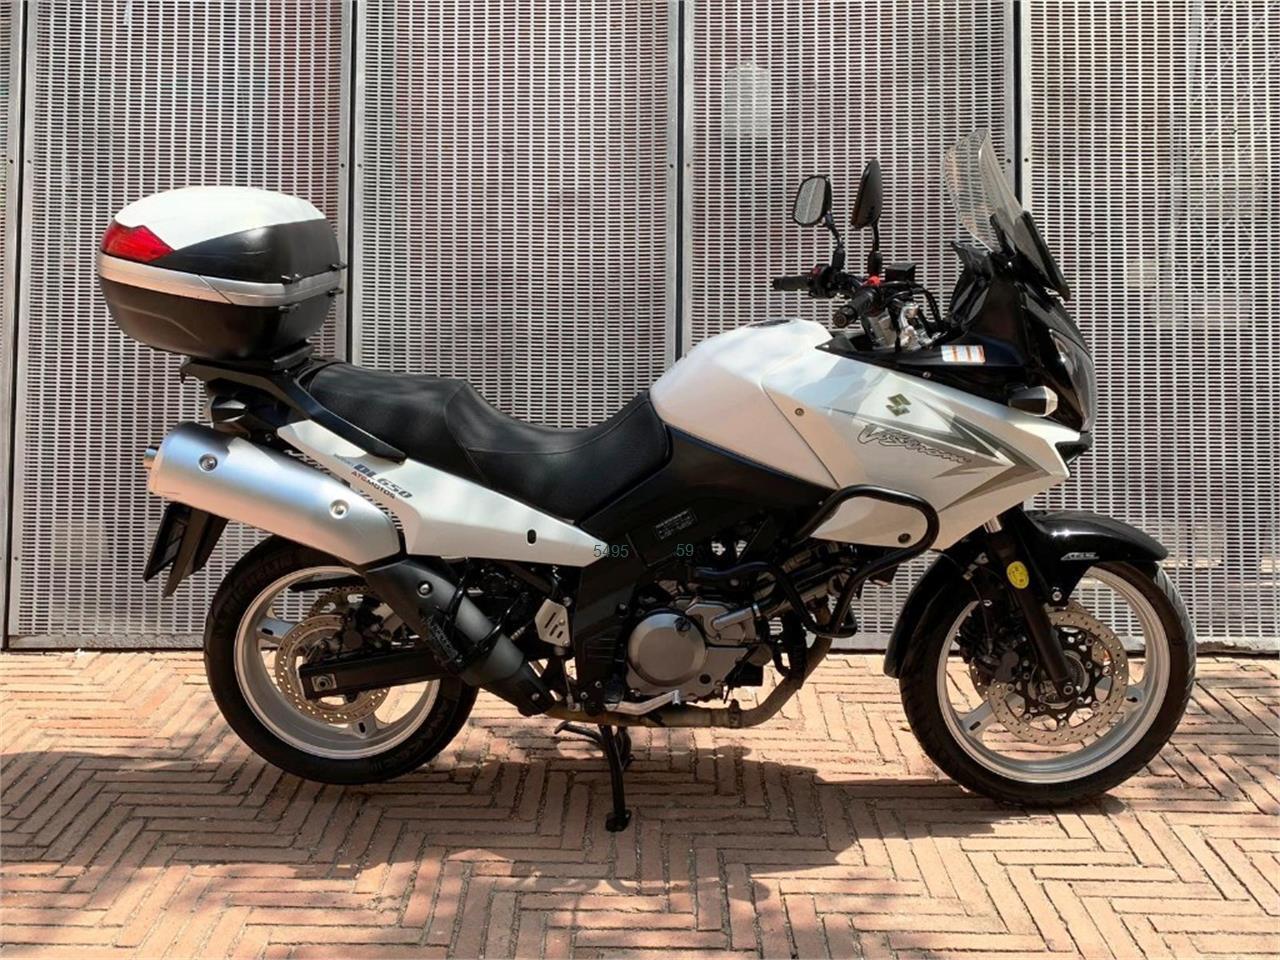 SUZUKI V-Strom 650 ABS de venta